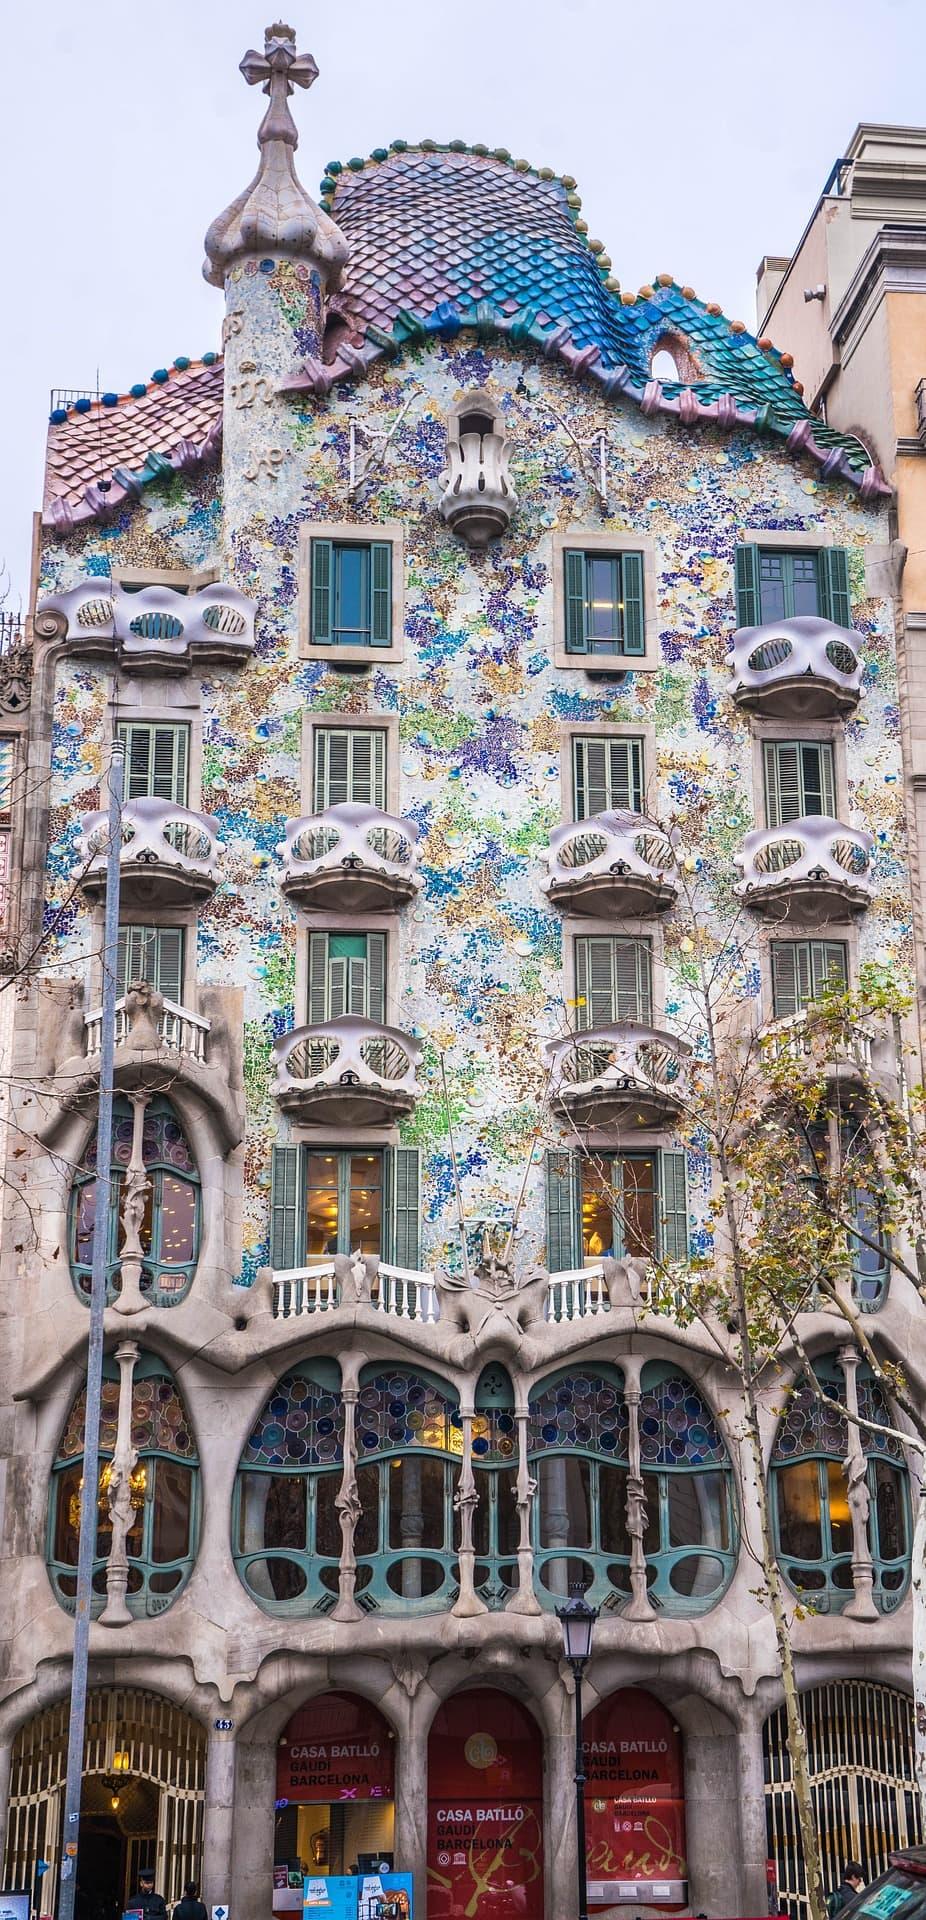 Casa Batllo on a one day in Barcelona tour